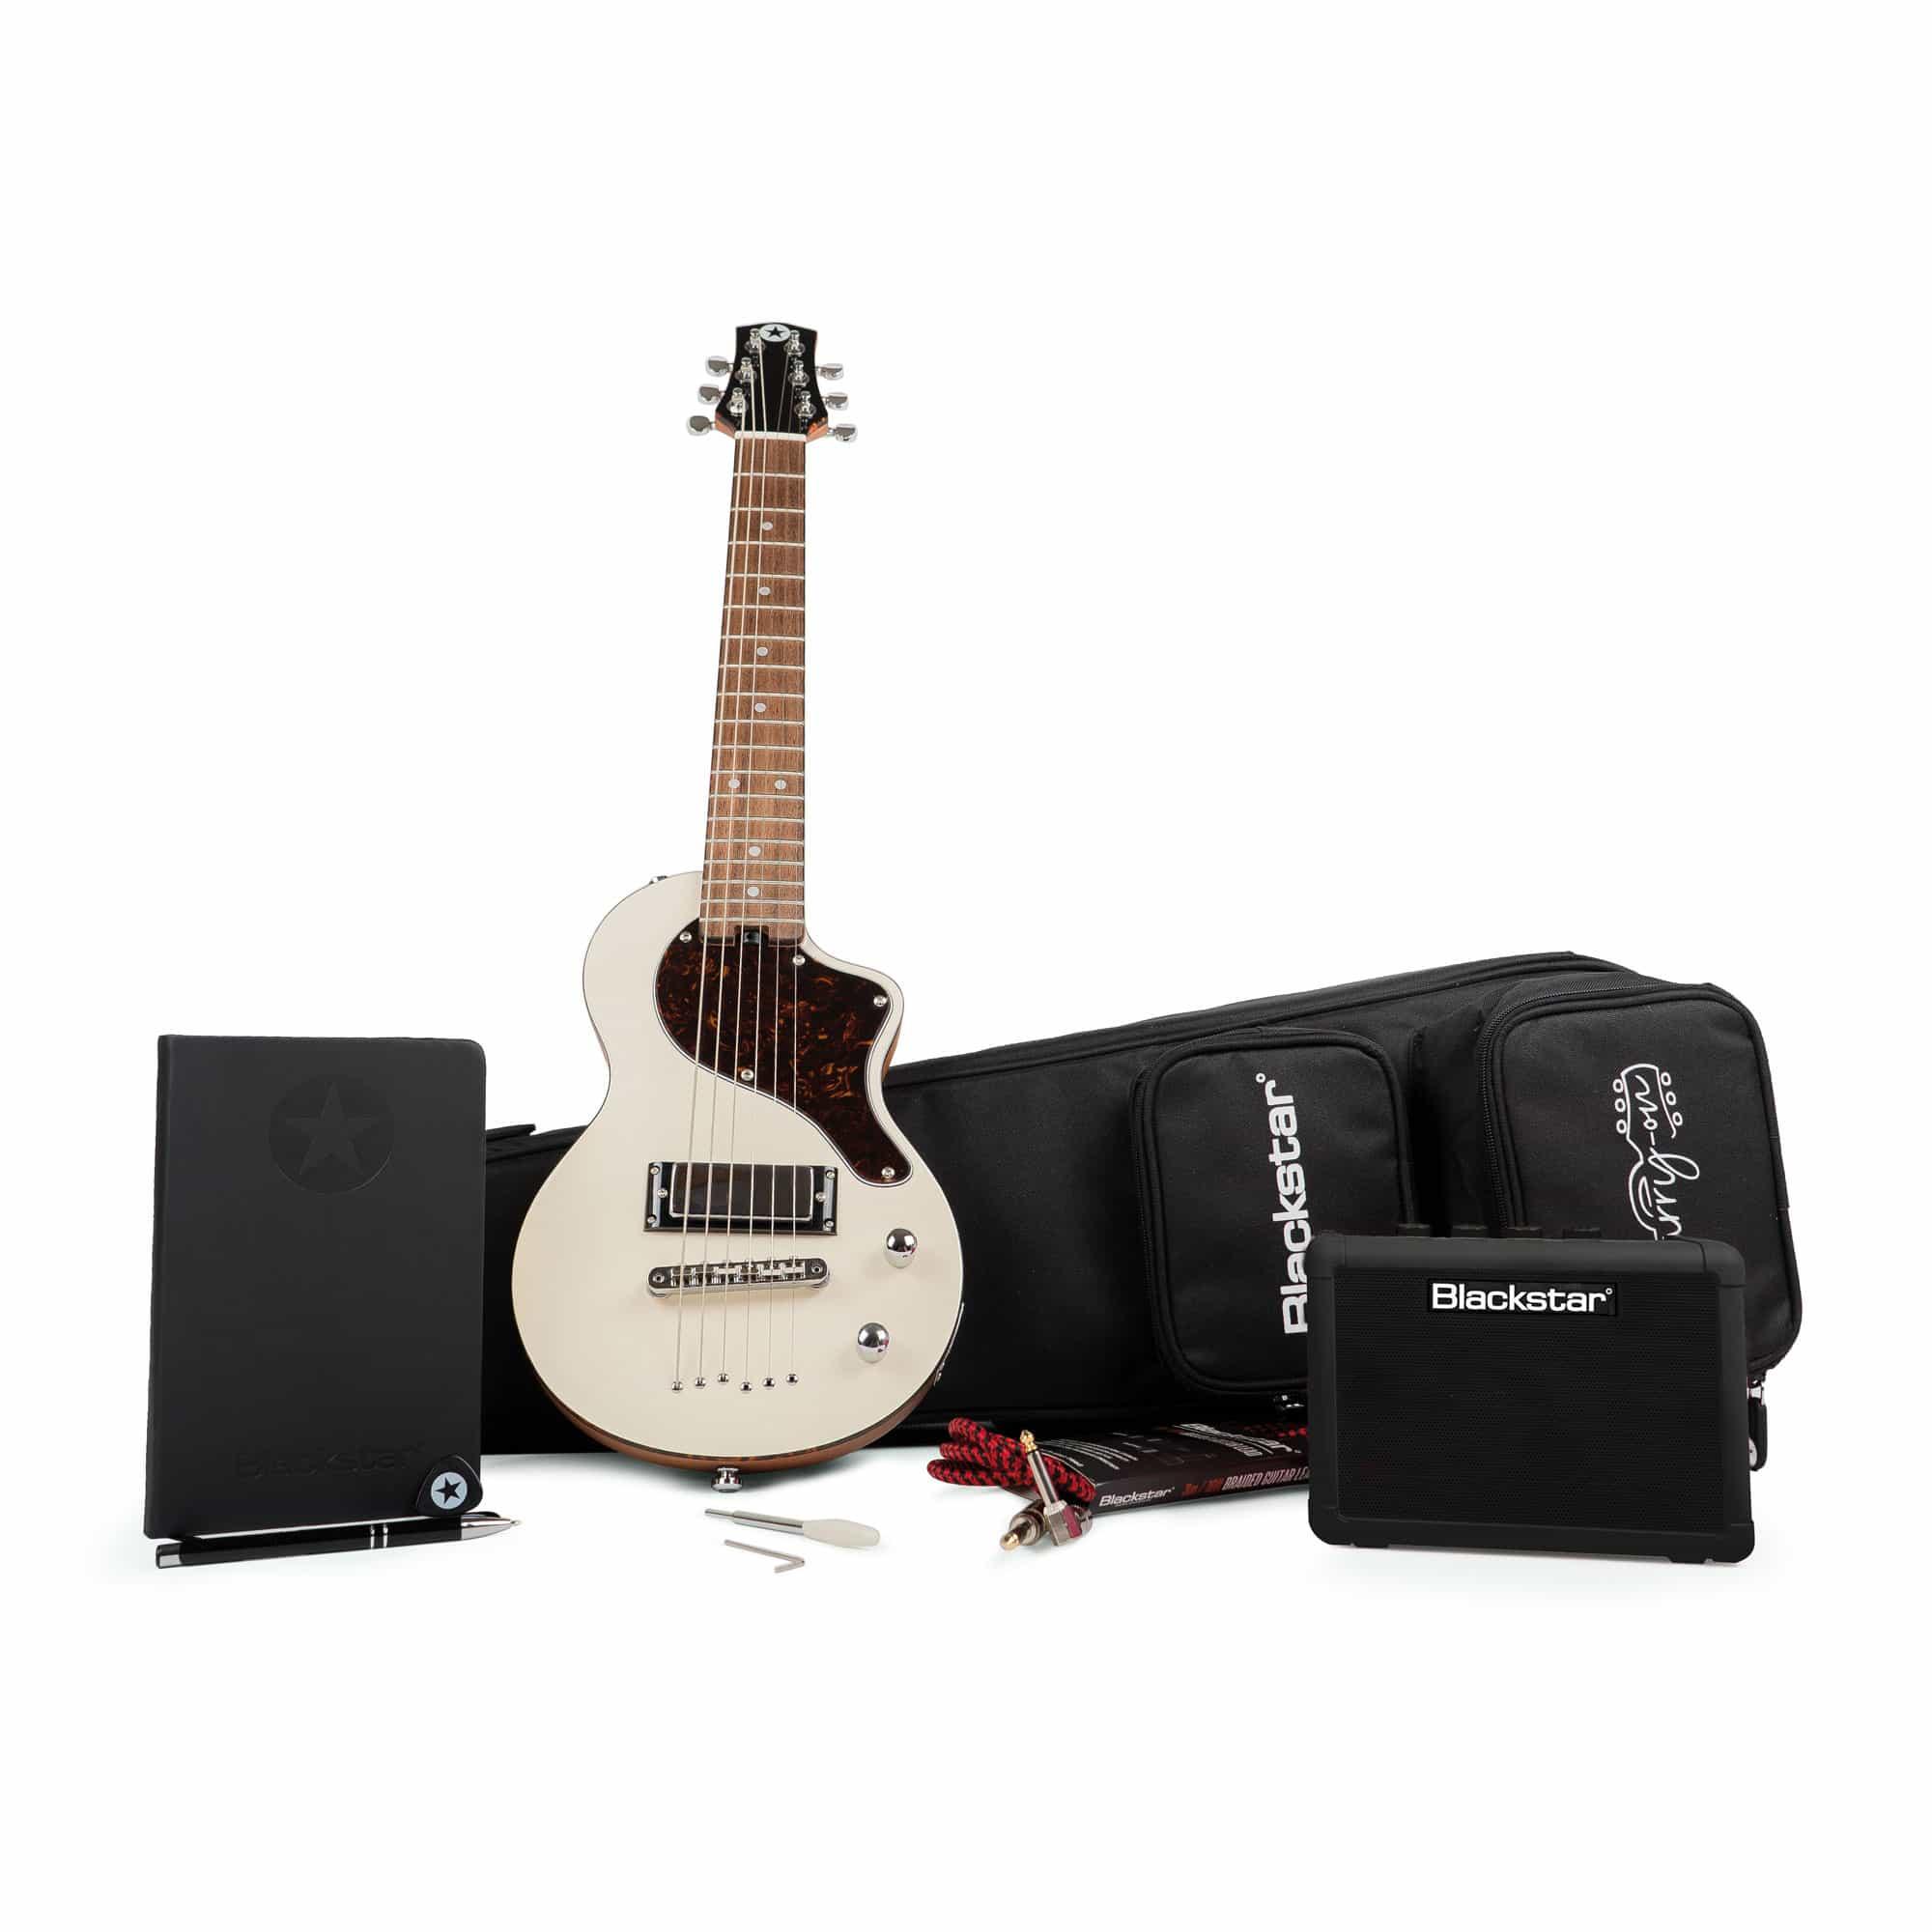 Kindergitarren - Blackstar Carry on Deluxe Pack Vintage White - Onlineshop Musikhaus Kirstein